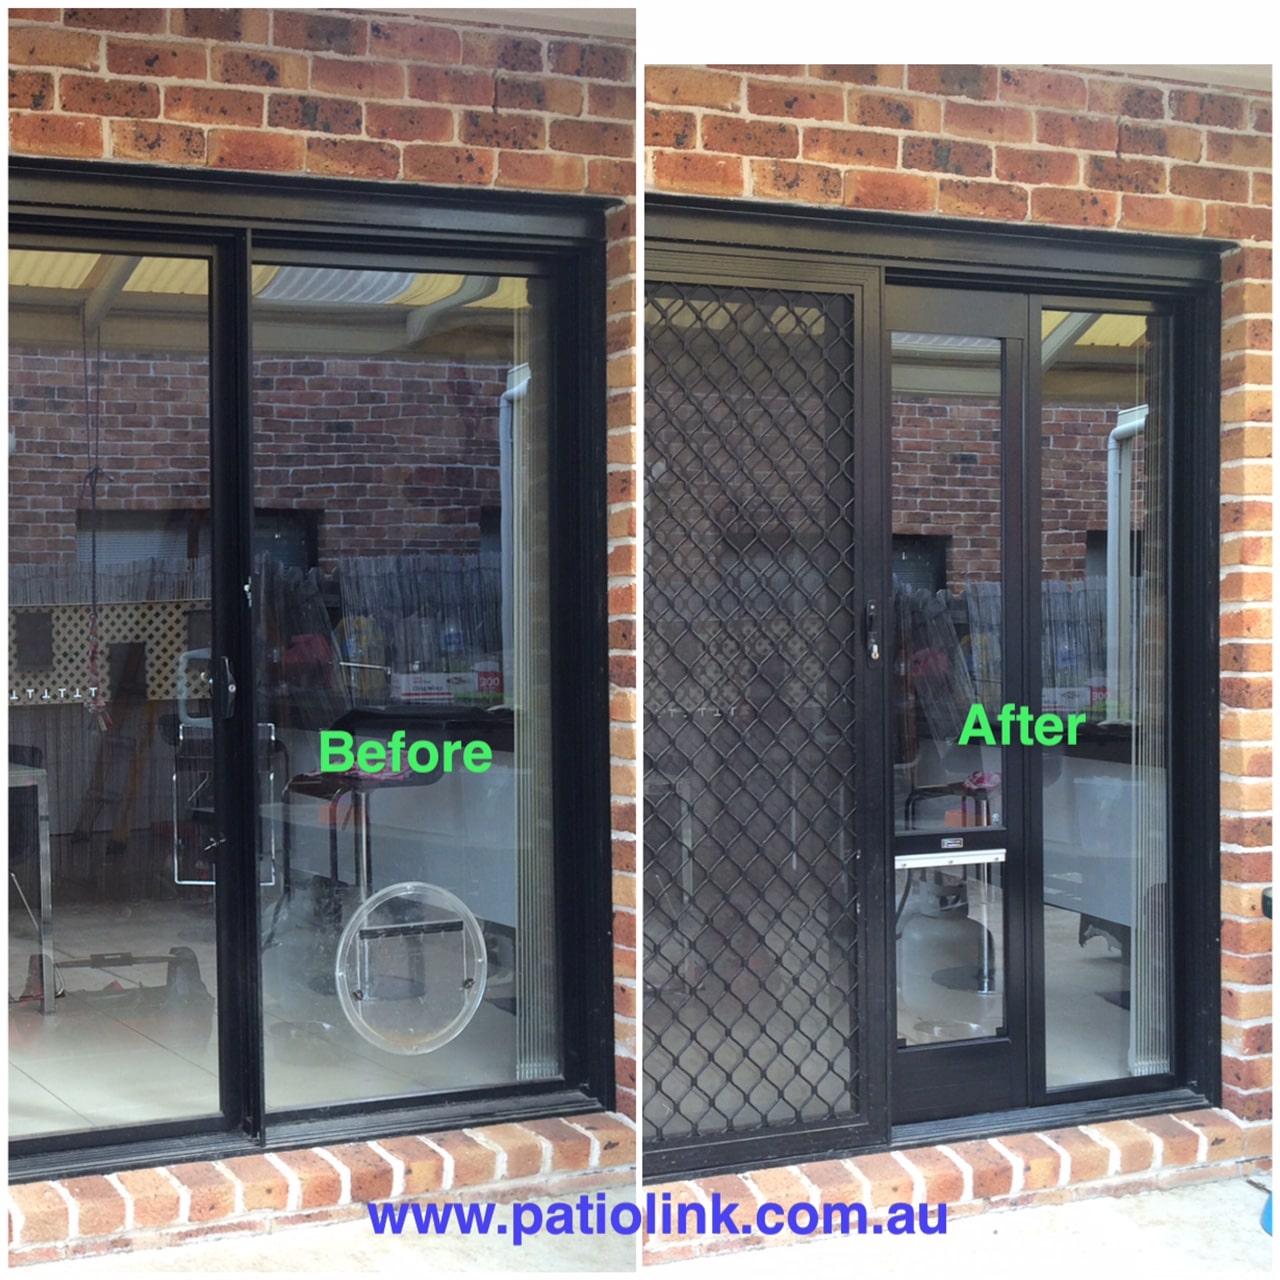 Pet Door Insert Before and After